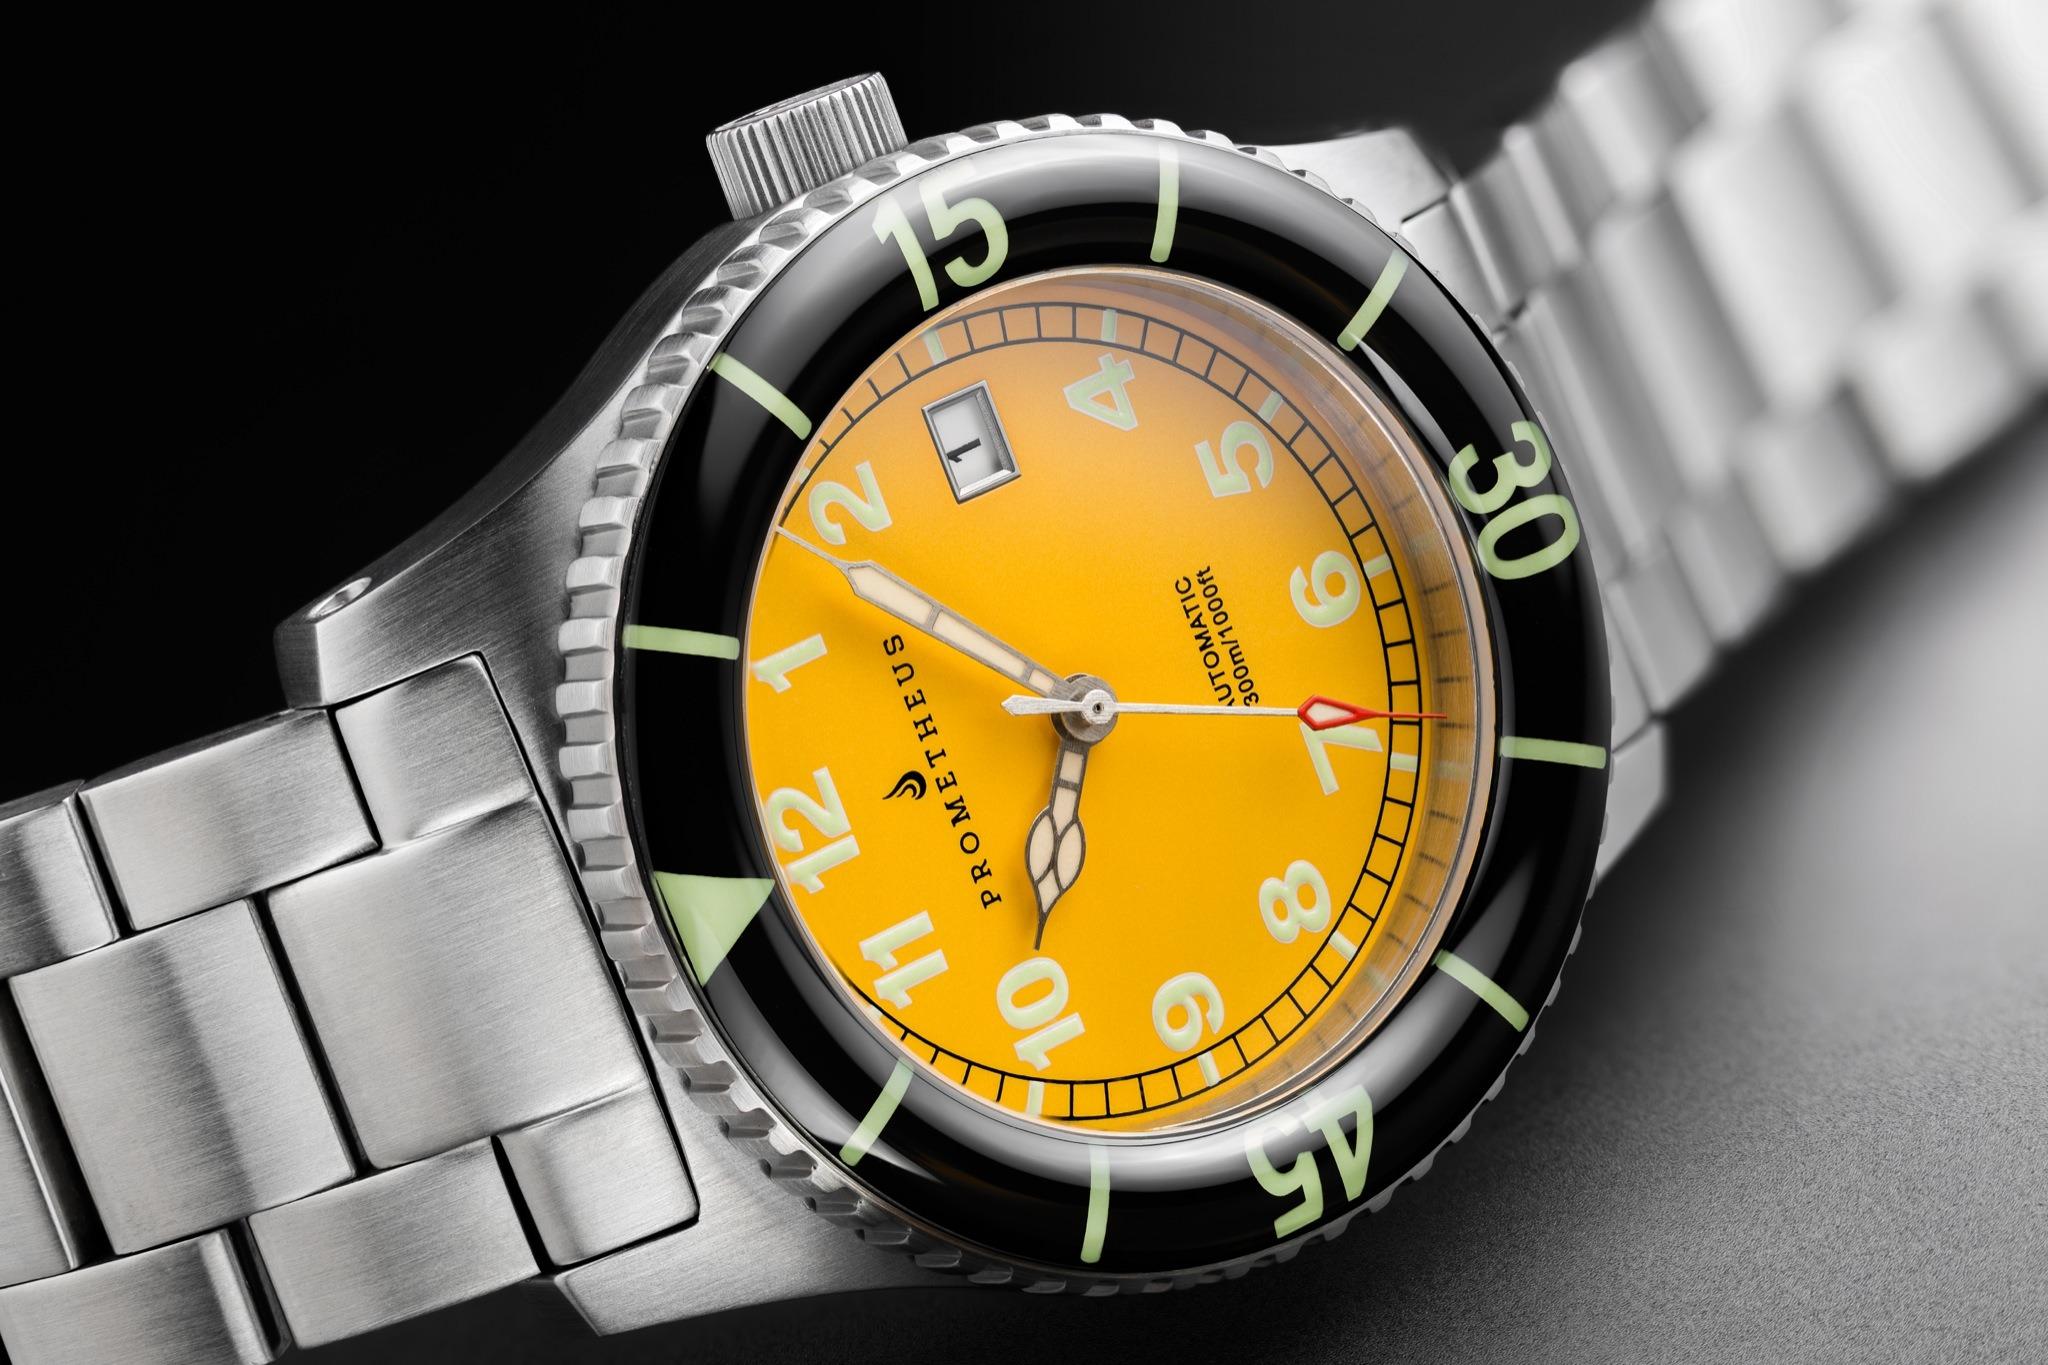 Prometheus Sailfish 300m Automatic Diver Watch Yellow Dial Sapphire Bezel